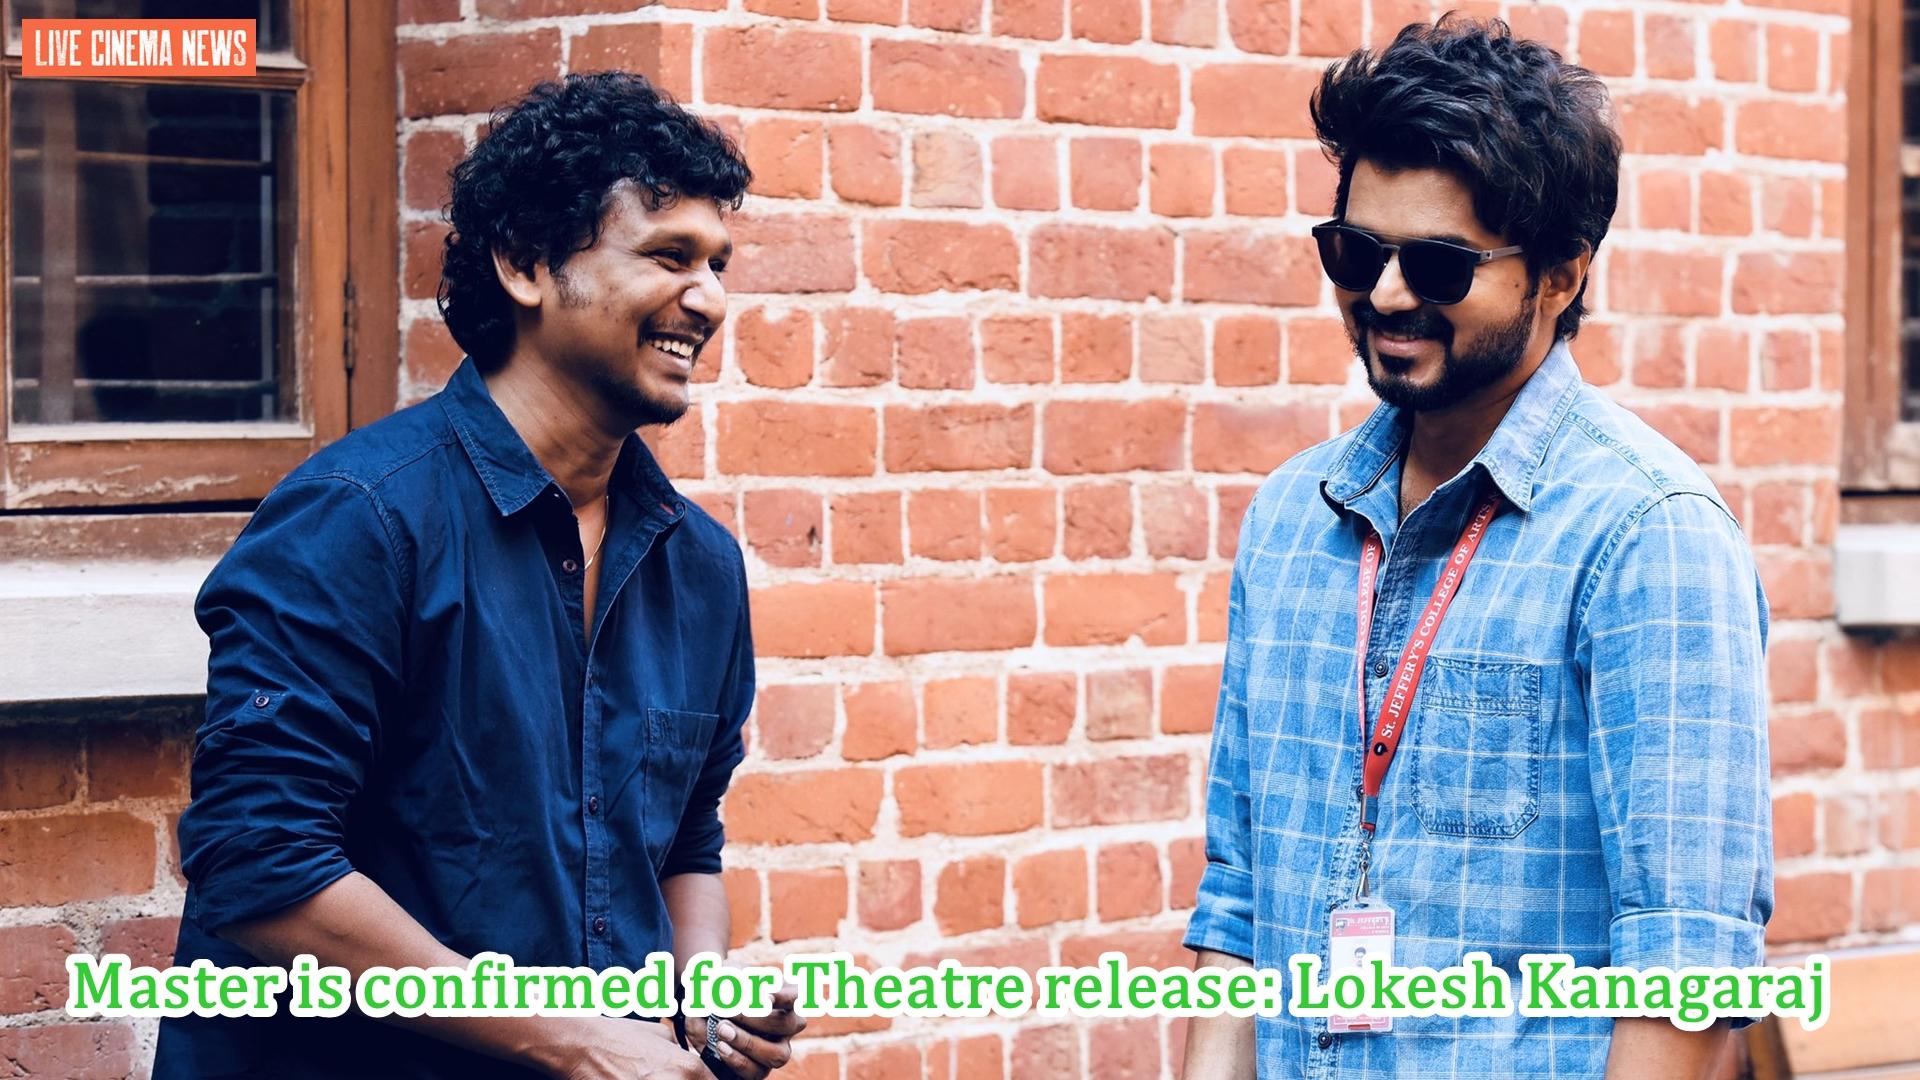 Master is confirmed for Theatre release: Lokesh Kanagaraj